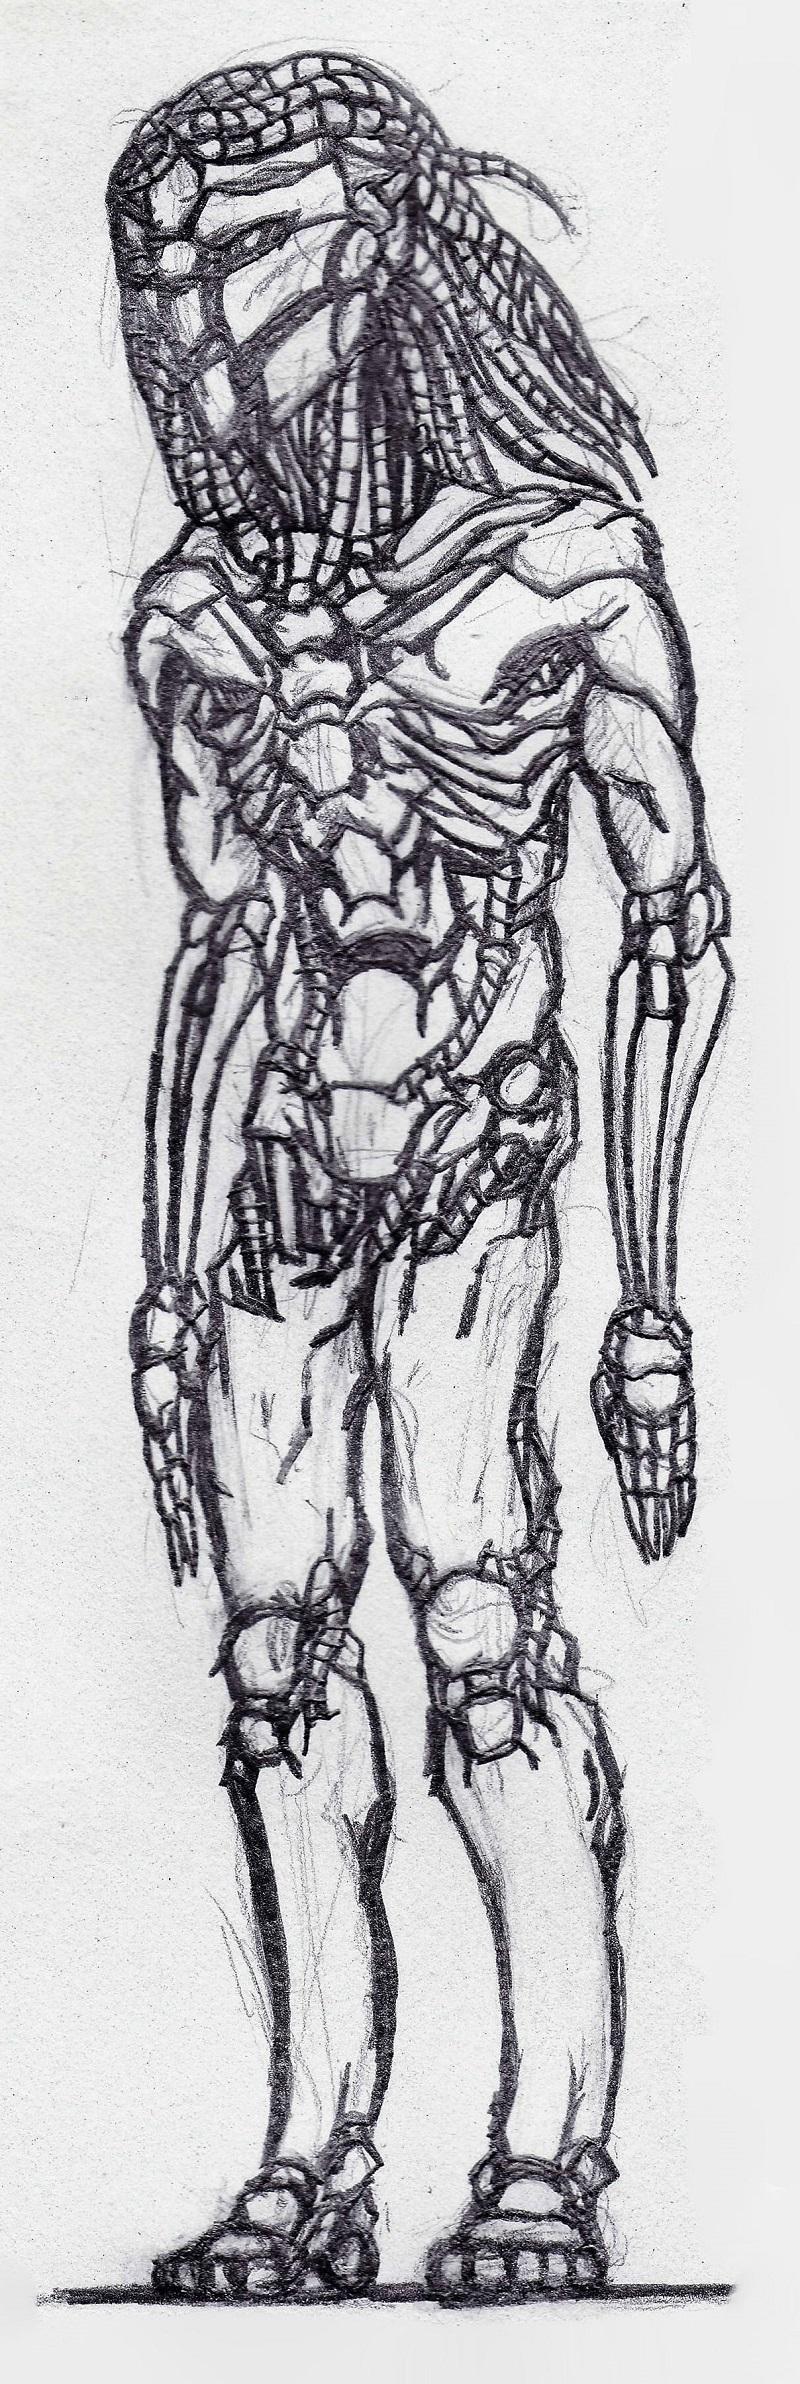 Tolle Grau Anatomie 6 Fotos - Anatomie Ideen - finotti.info